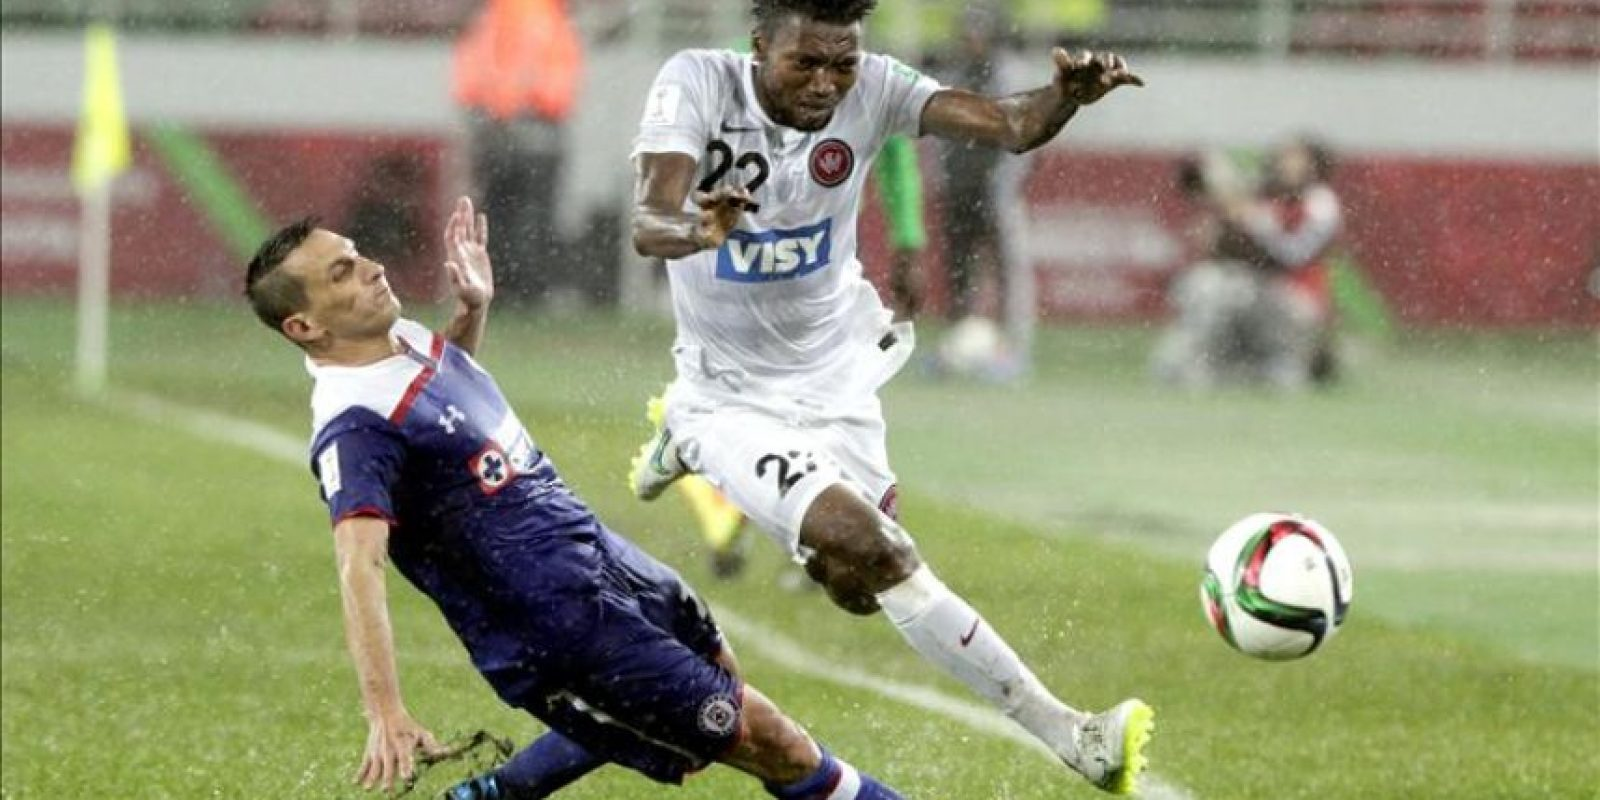 El jugador del Cruz Azul Christian Gimenez (I) trata de frenar a Seyi Adaeleka, del WS Wanderers FC durante el partido del Mundialito de Clubes que se está disputando en Rabat, Marruecos. EFE/EPA